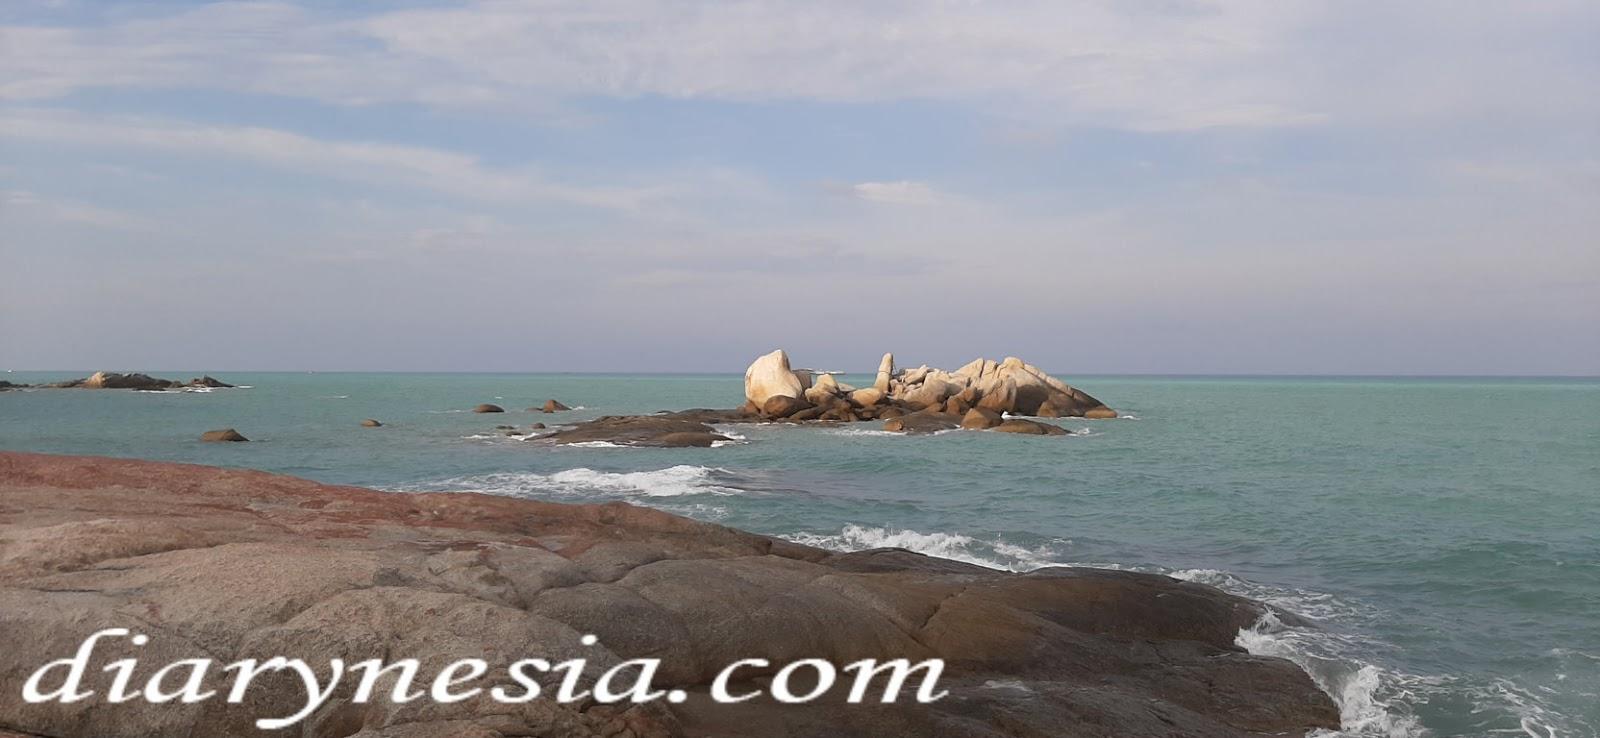 bangka belitung tourism, parai tenggiri beach, things to do in parai tenggiri beach, diarynesia